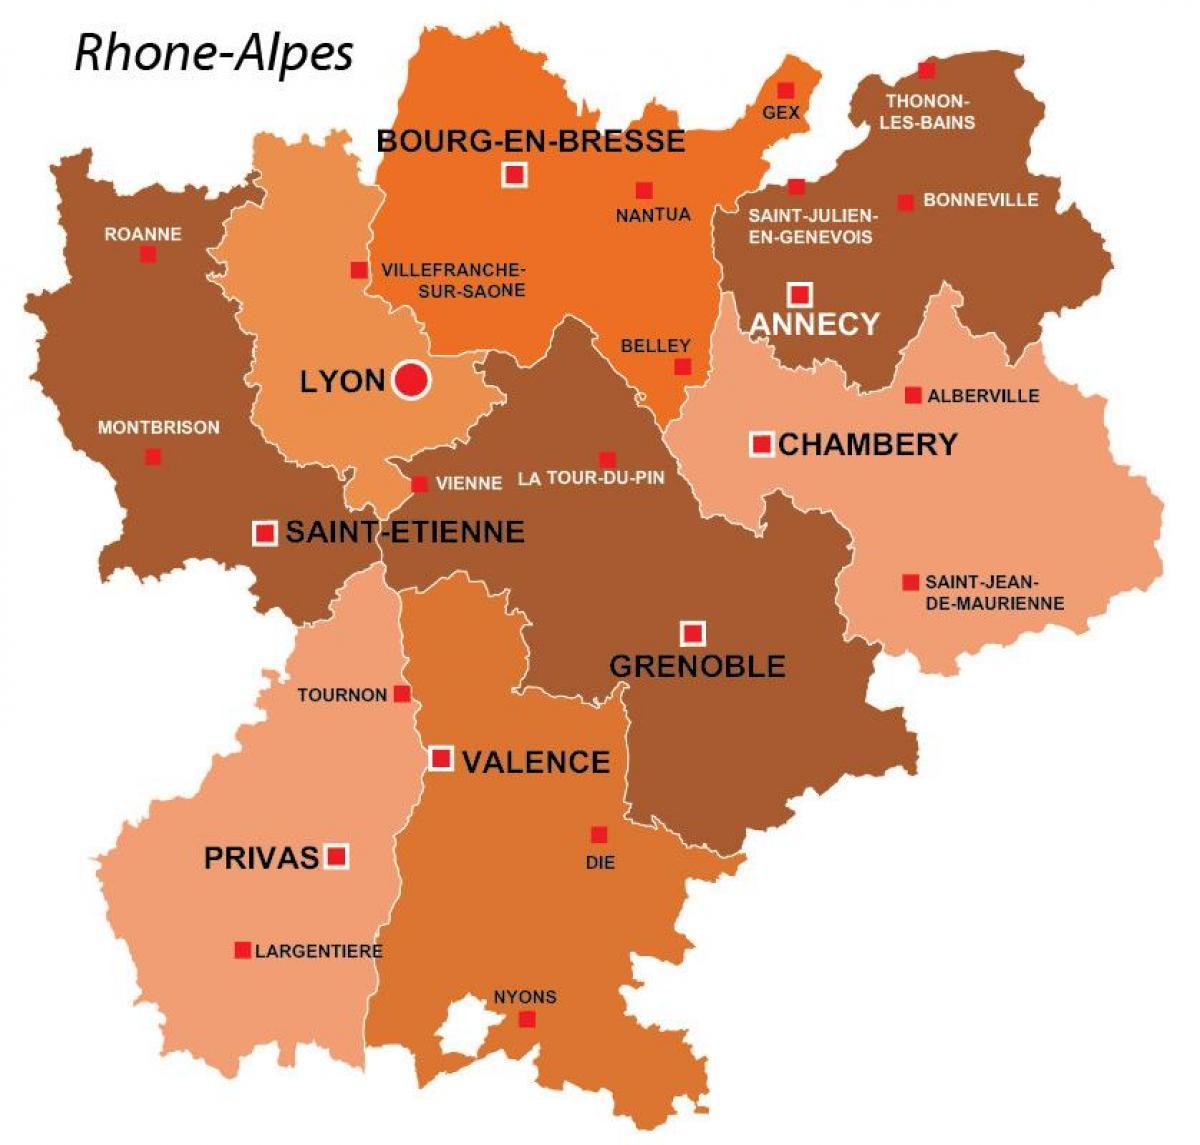 Lyon Karta Regija Lyon Podrucje Karta Francuske Auvergne Rhone